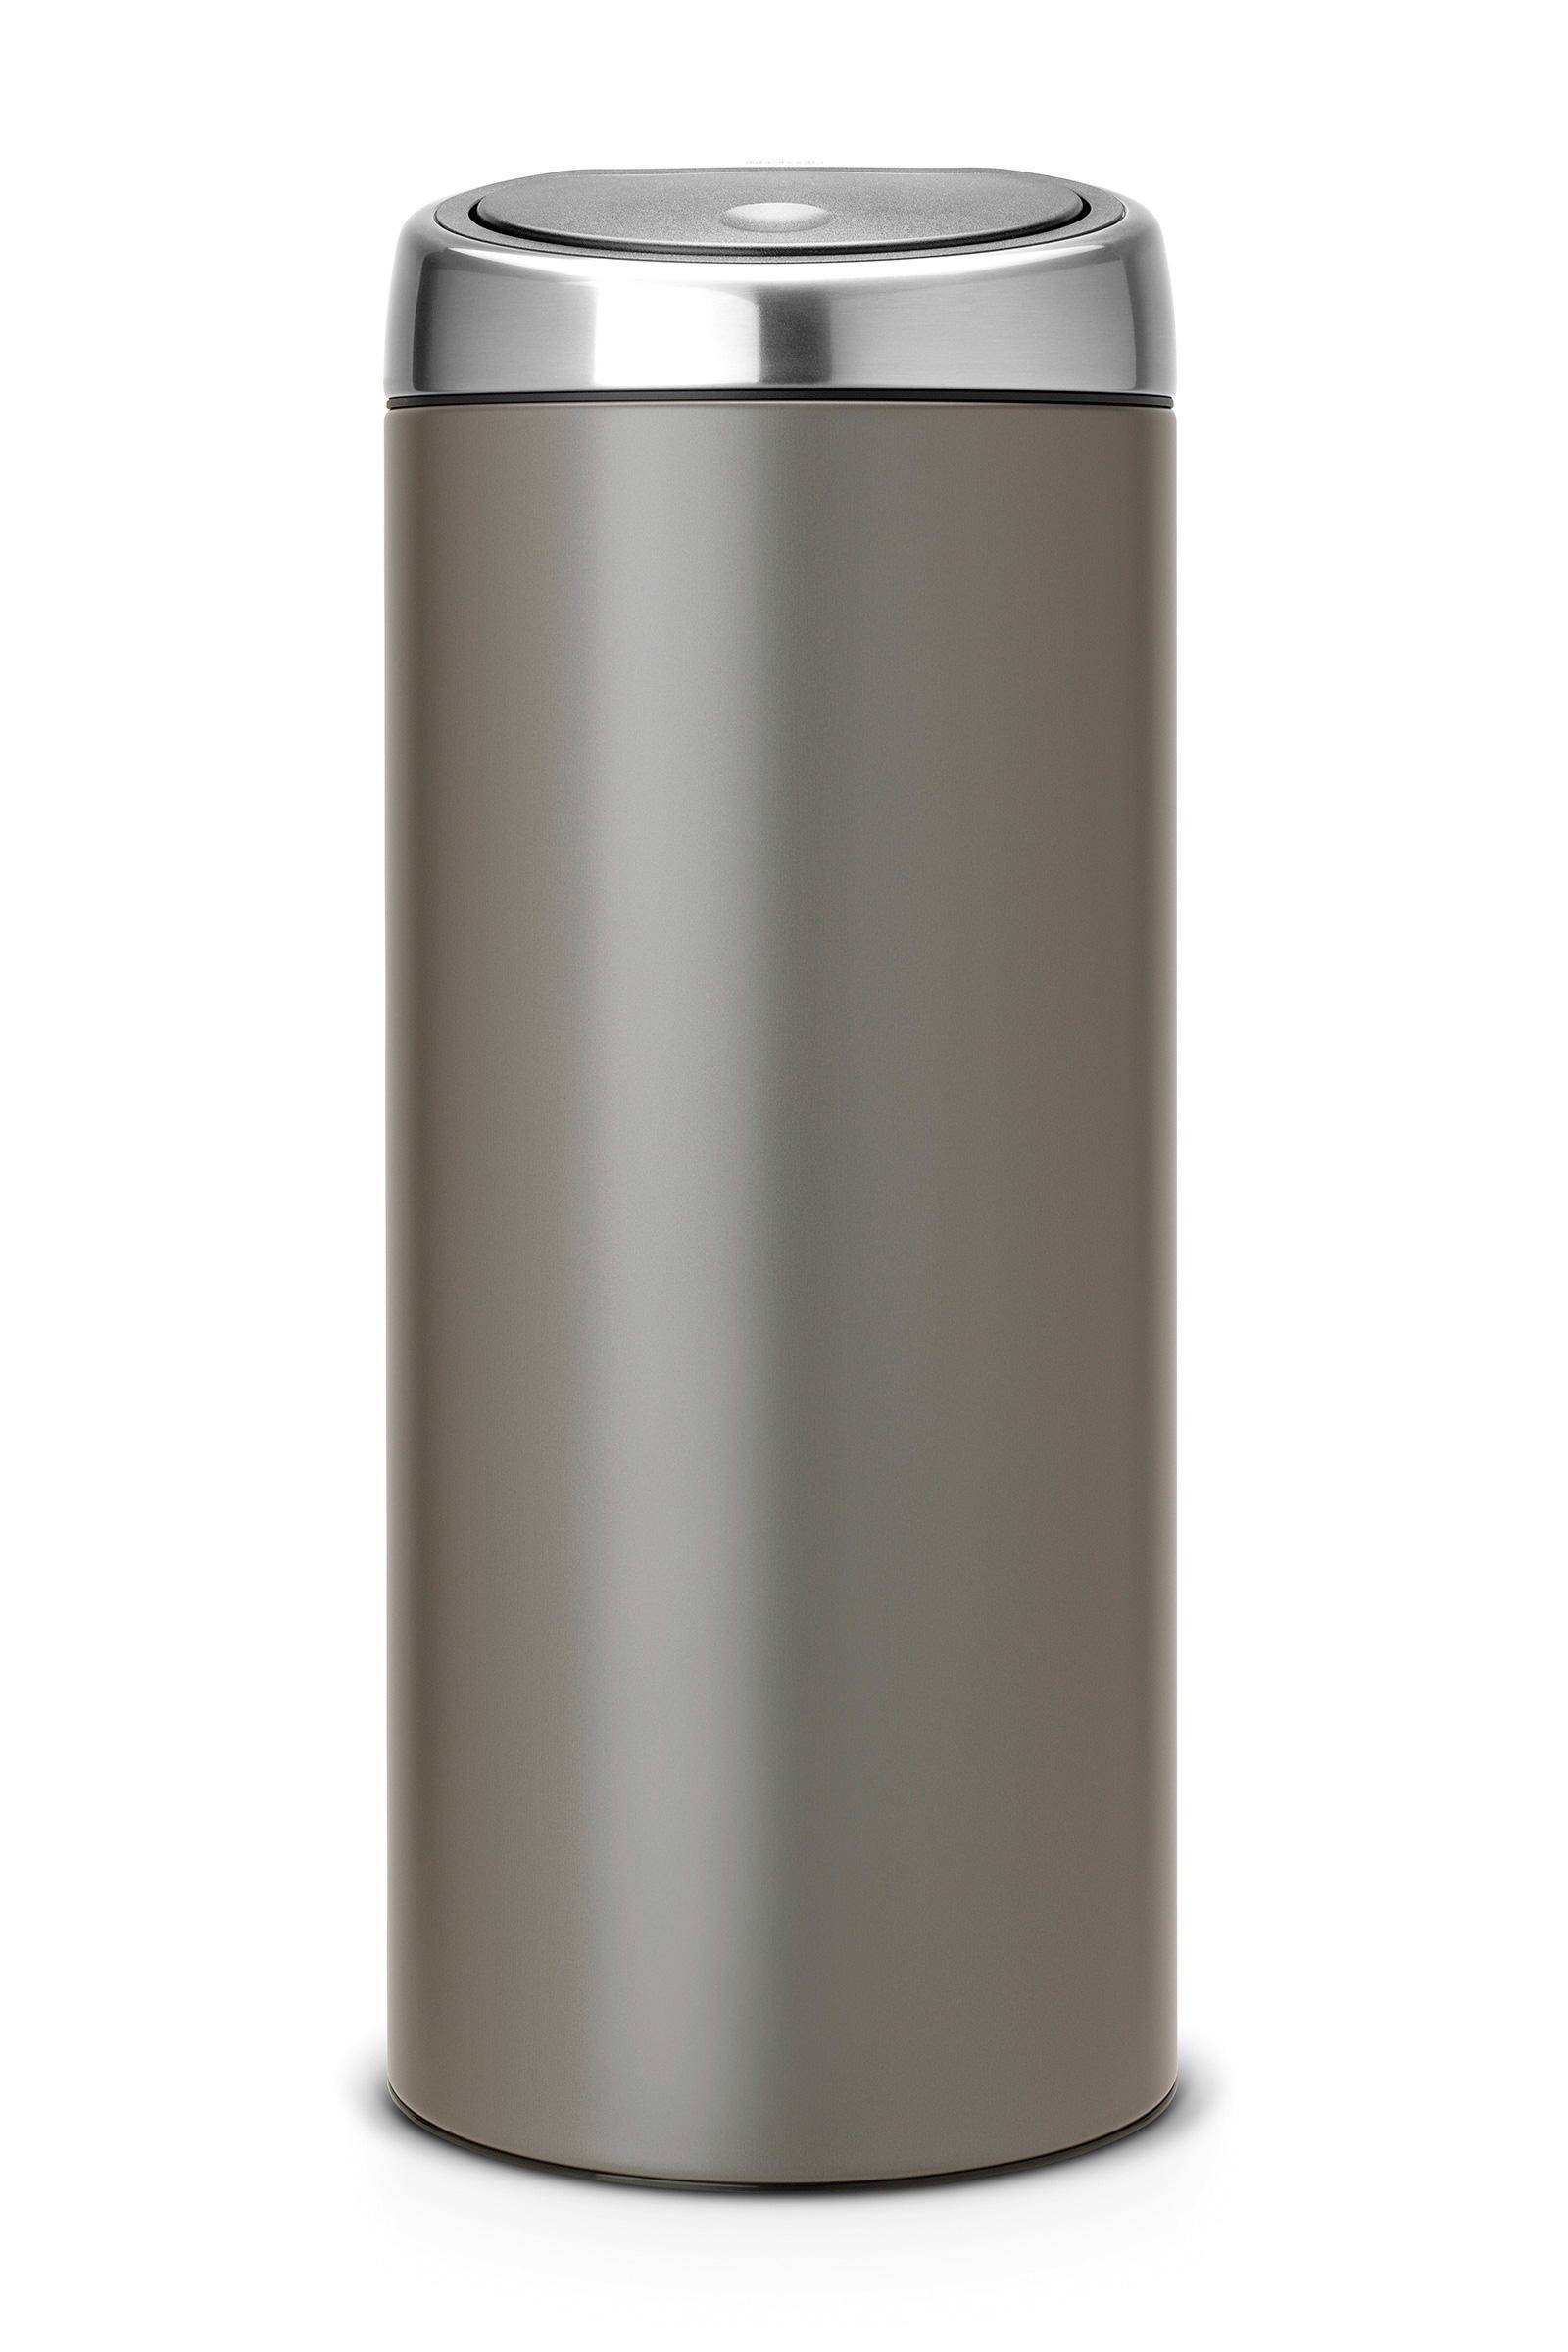 Brabantia Afvalbak 30 Liter.Brabantia Touch Bin 30 Liter Prullenbak Wehkamp